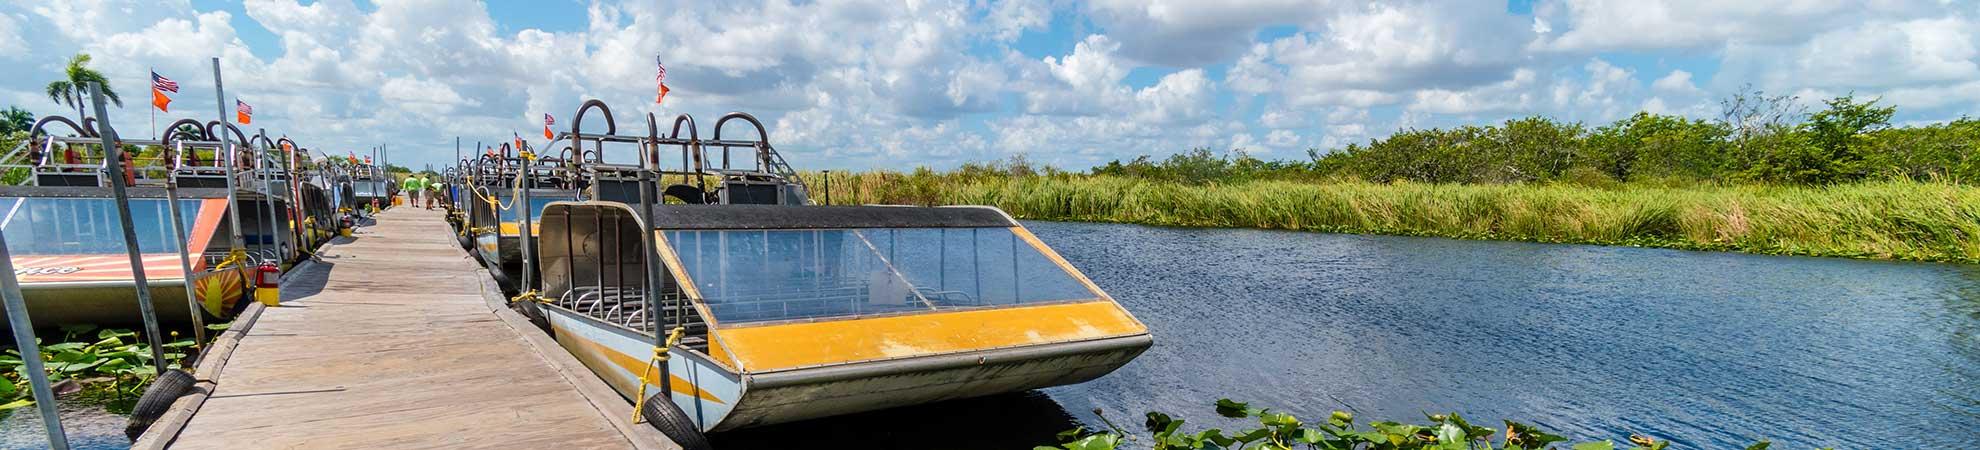 Floride parcs d'attractions